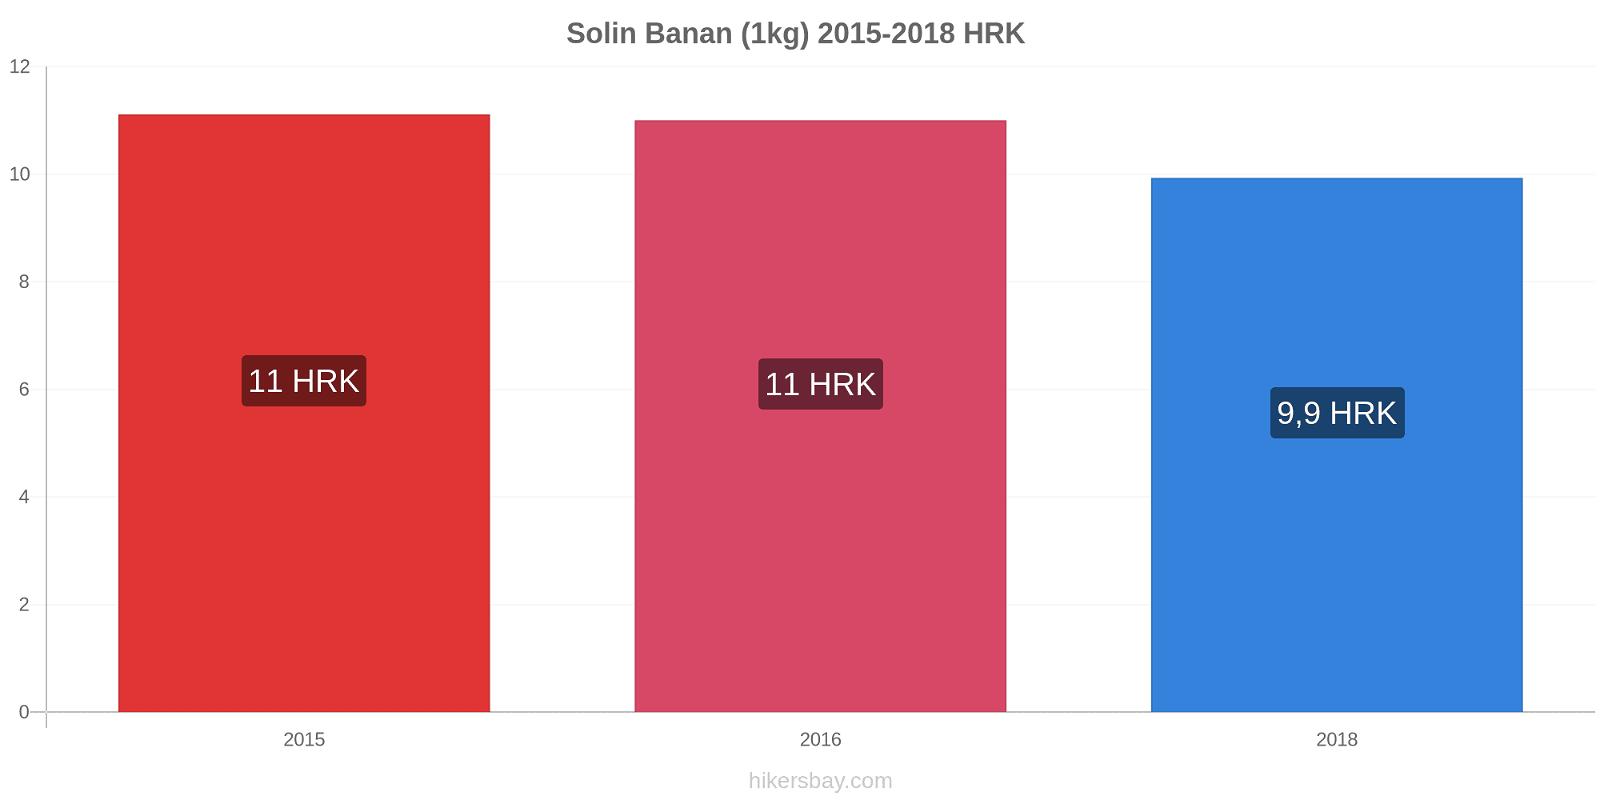 Solin prisændringer Banan (1kg) hikersbay.com